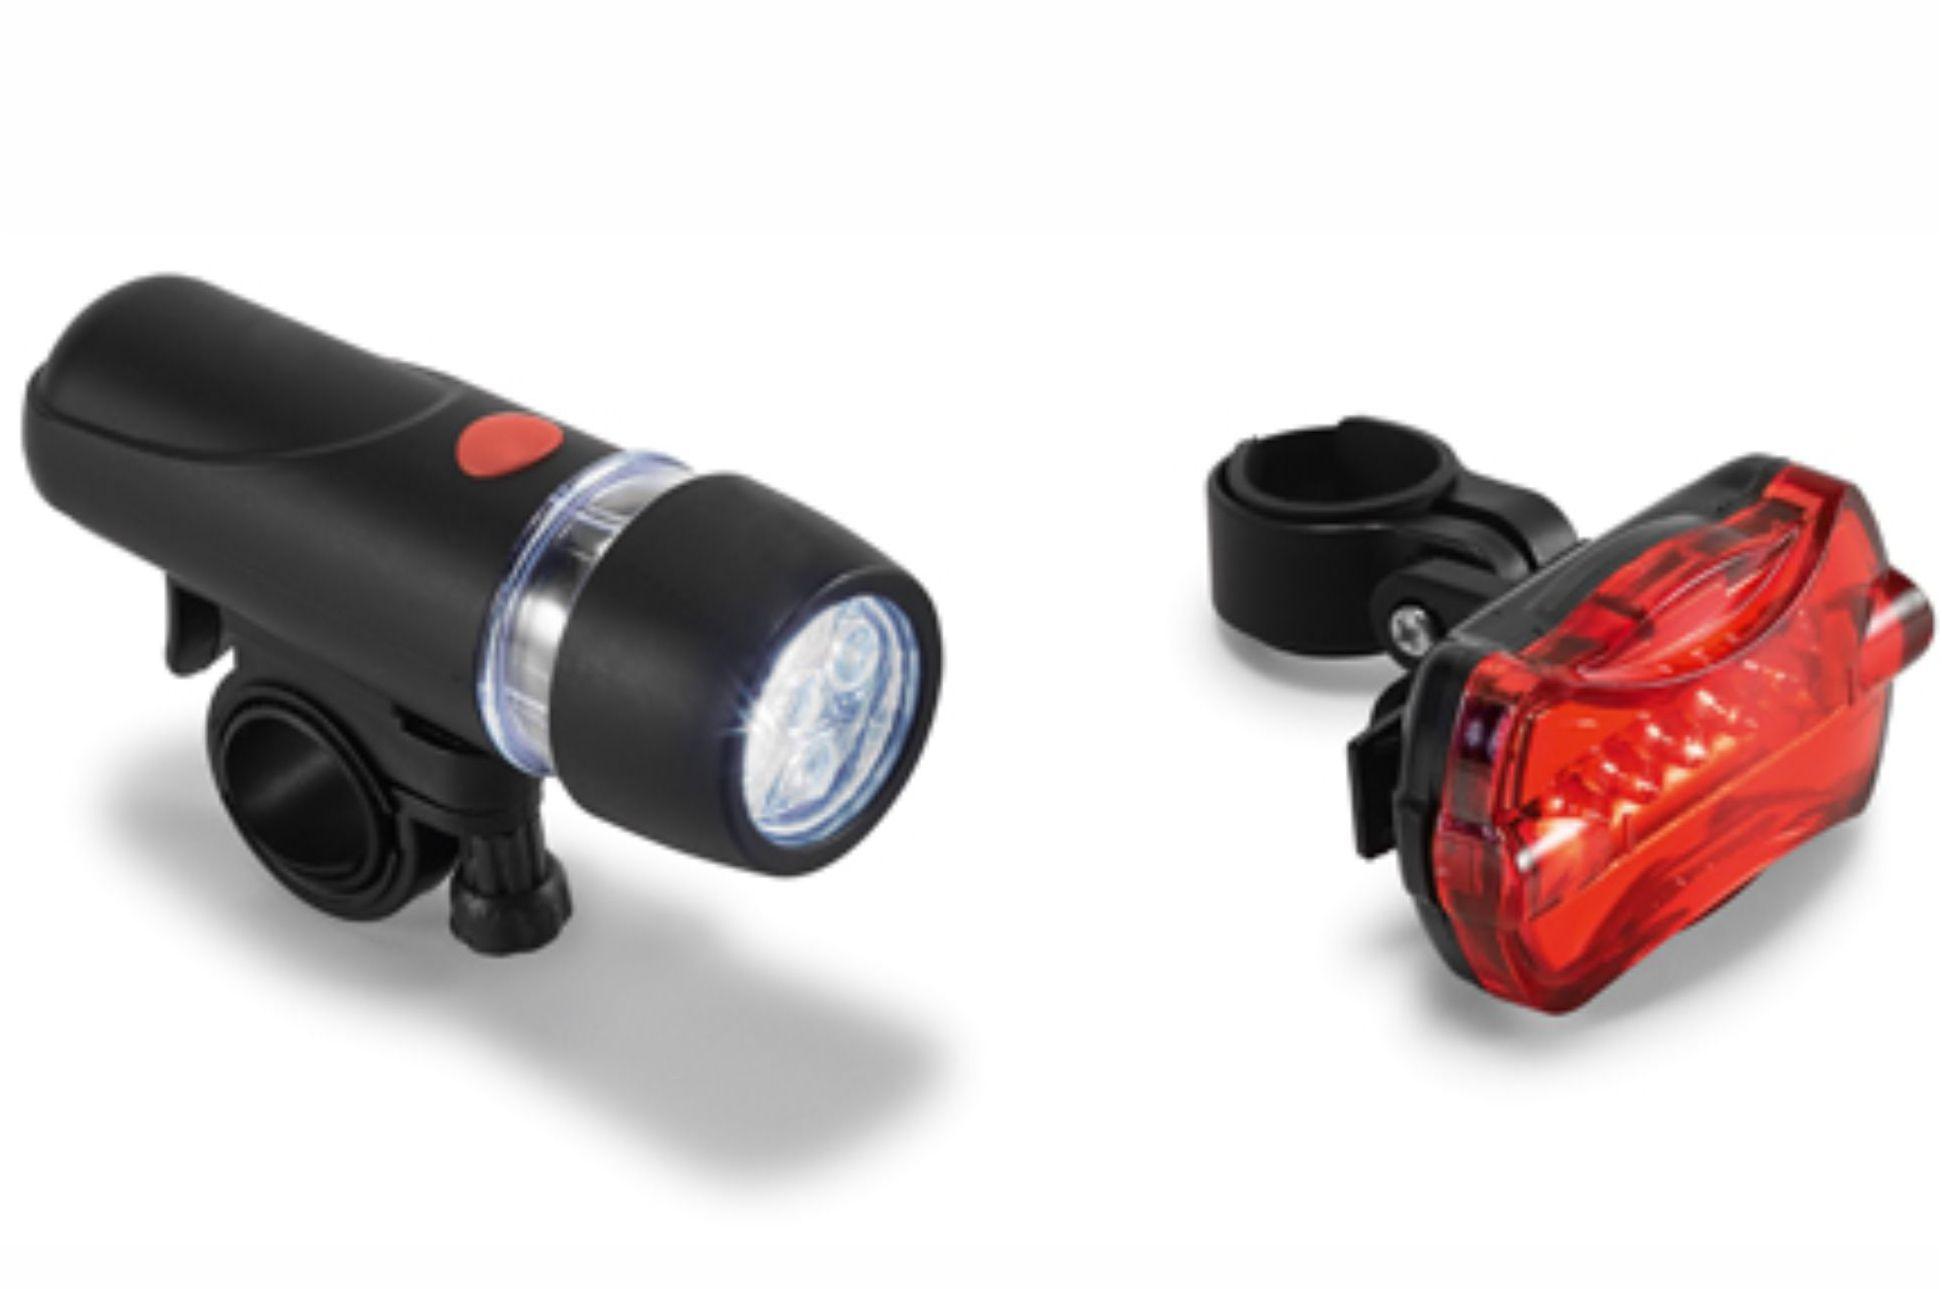 KF507SP – Kit farol para bicicleta – Promocional